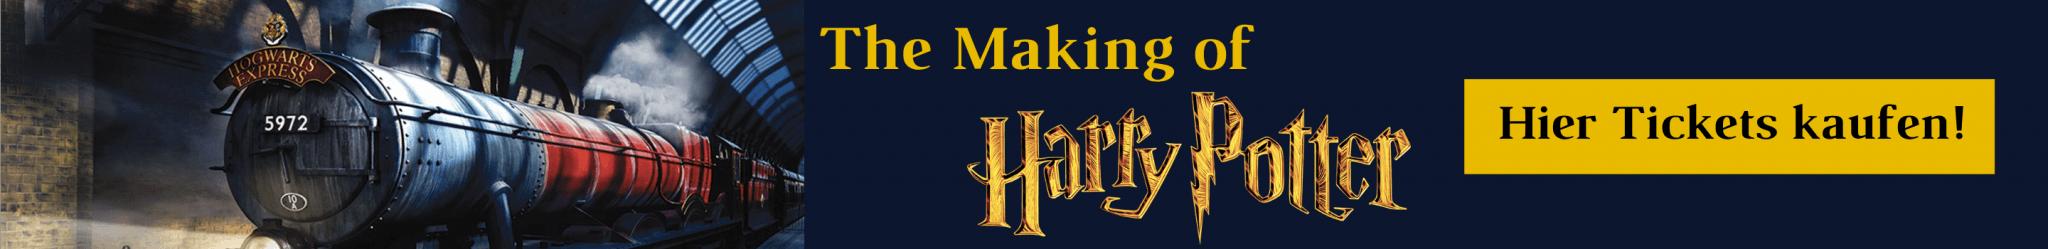 Harry Potter Studio Tour Tickets Banner